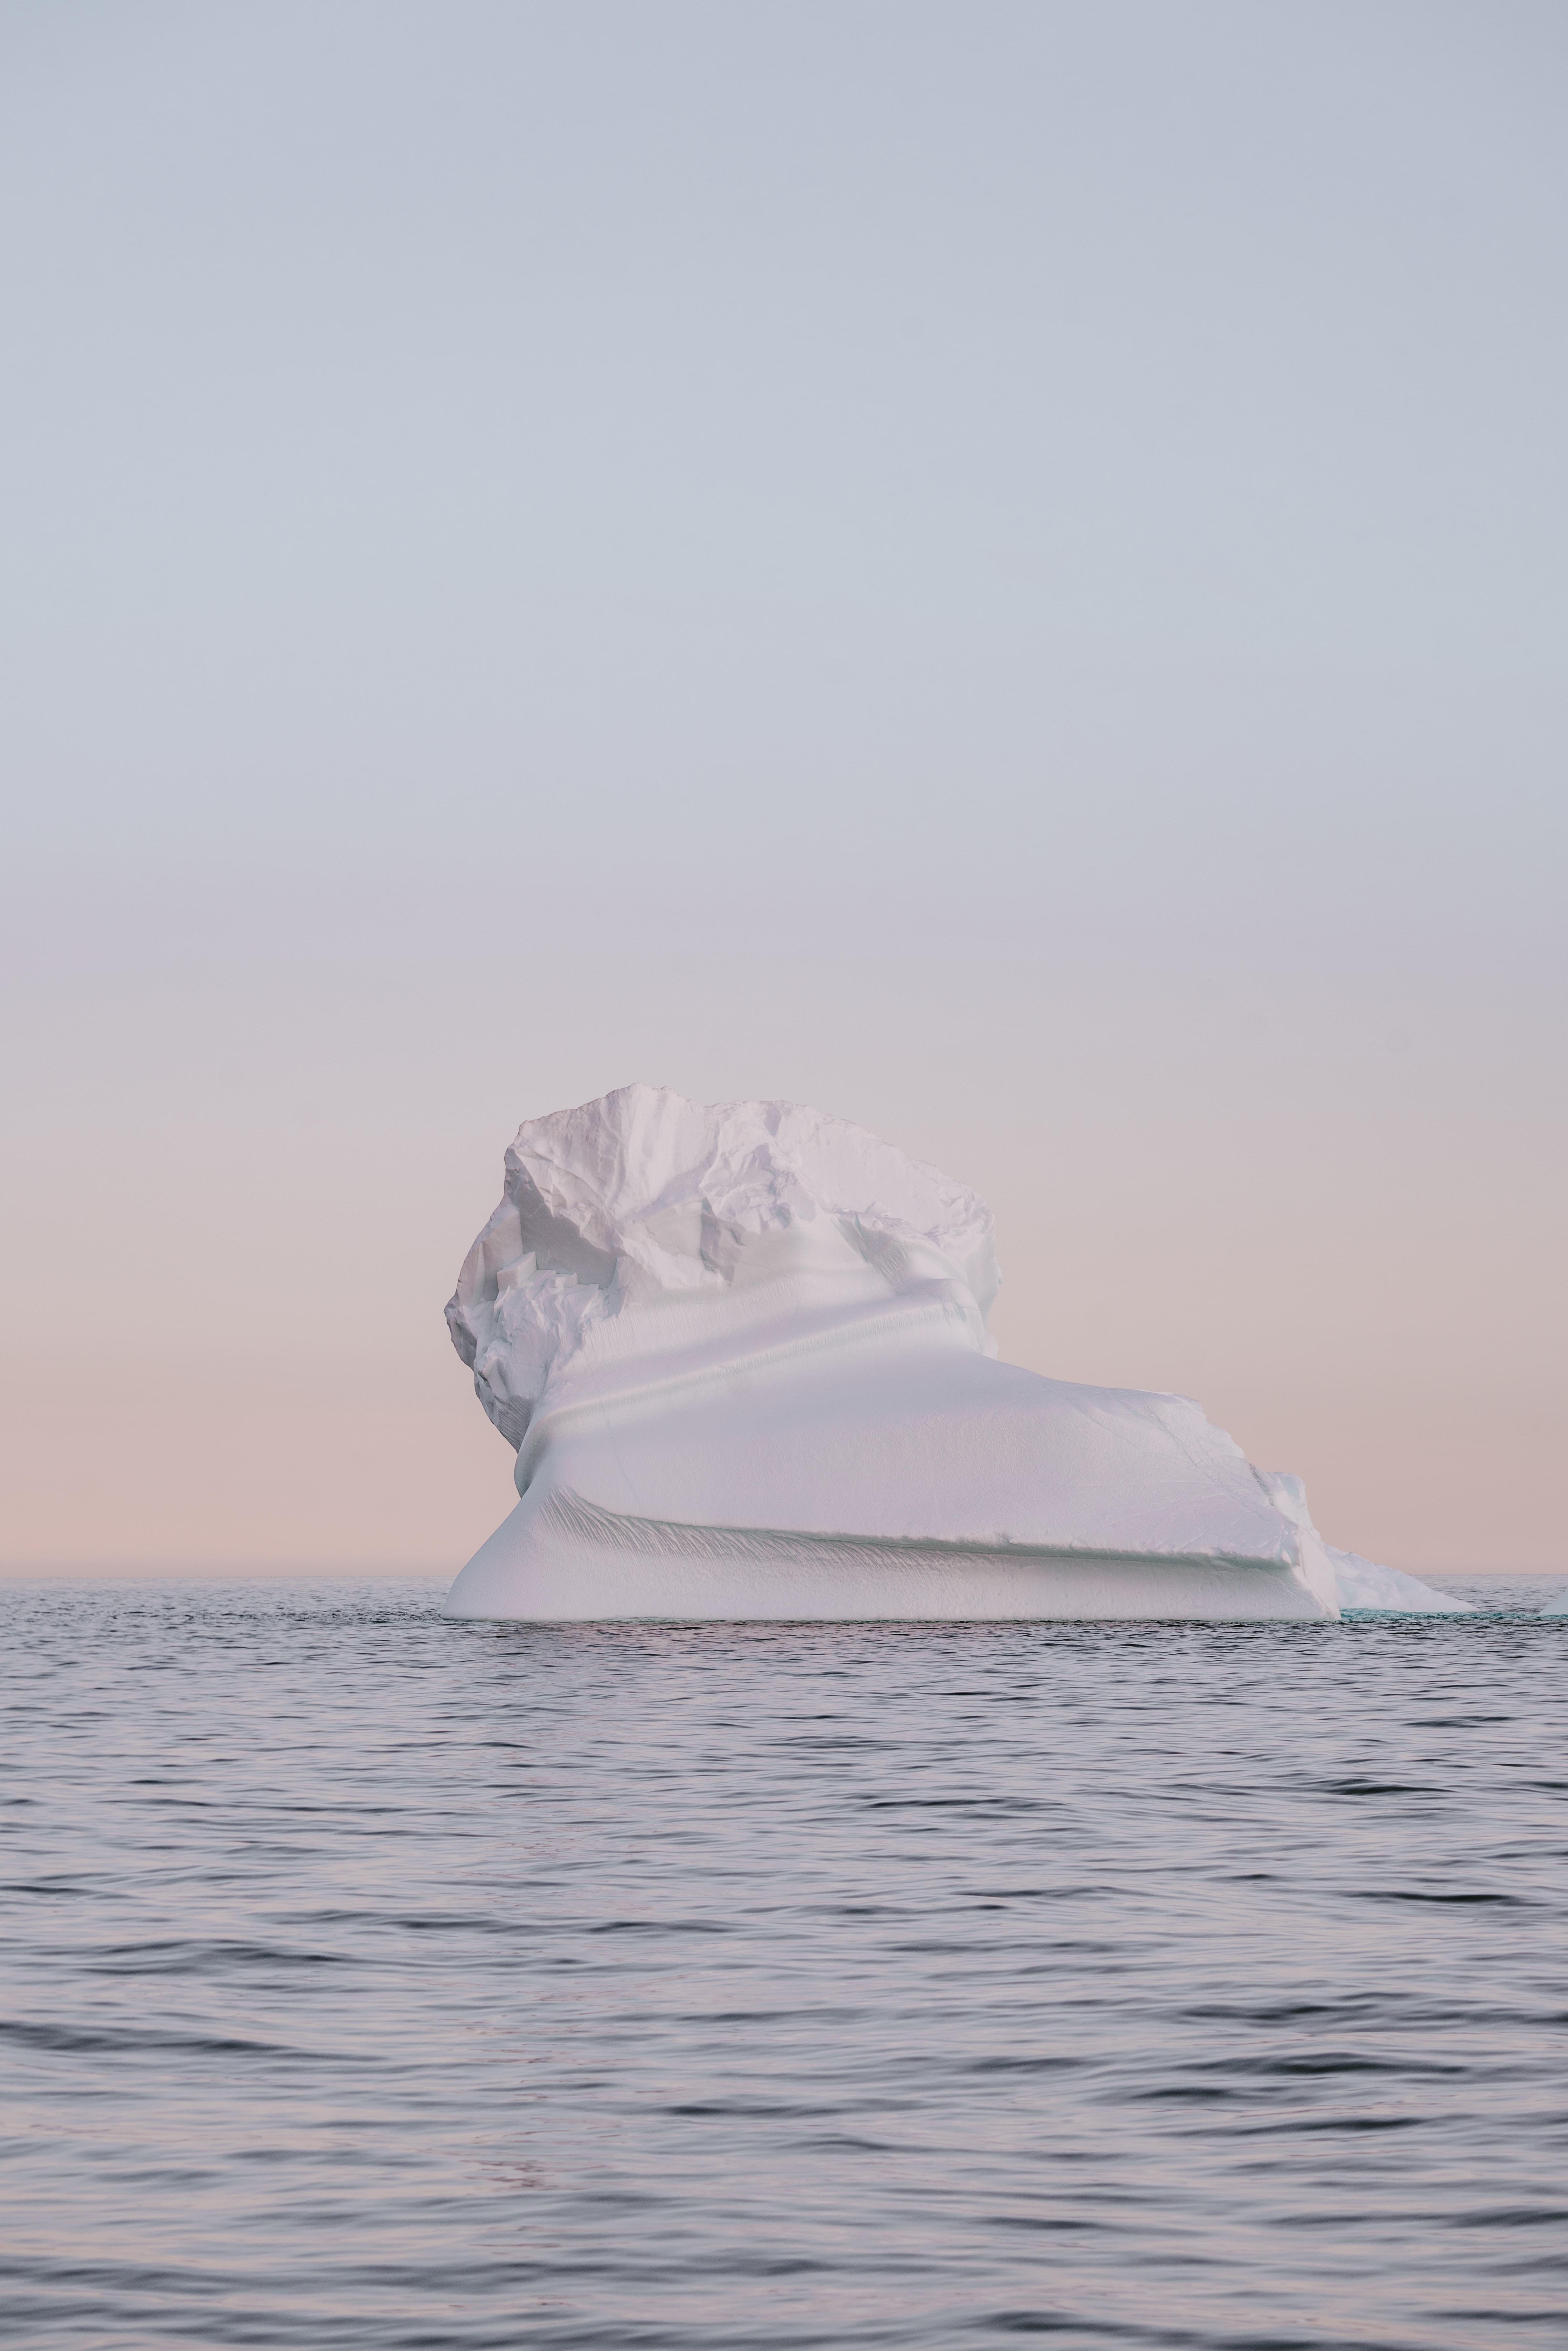 ice berg during daytime